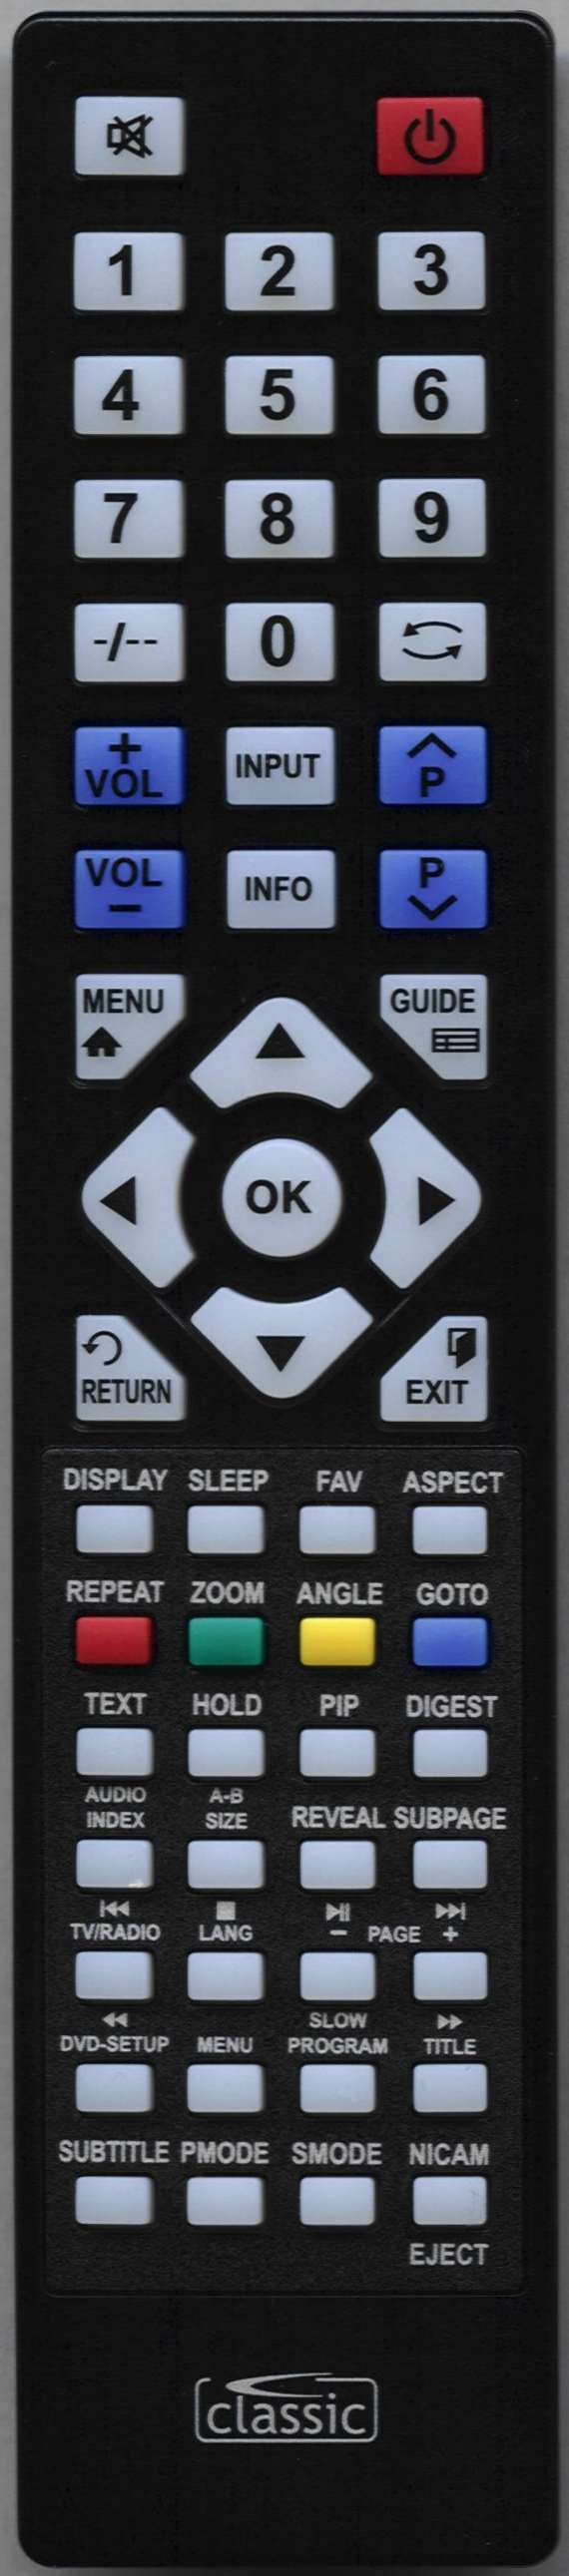 Baird JO32BAIRD Remote Control